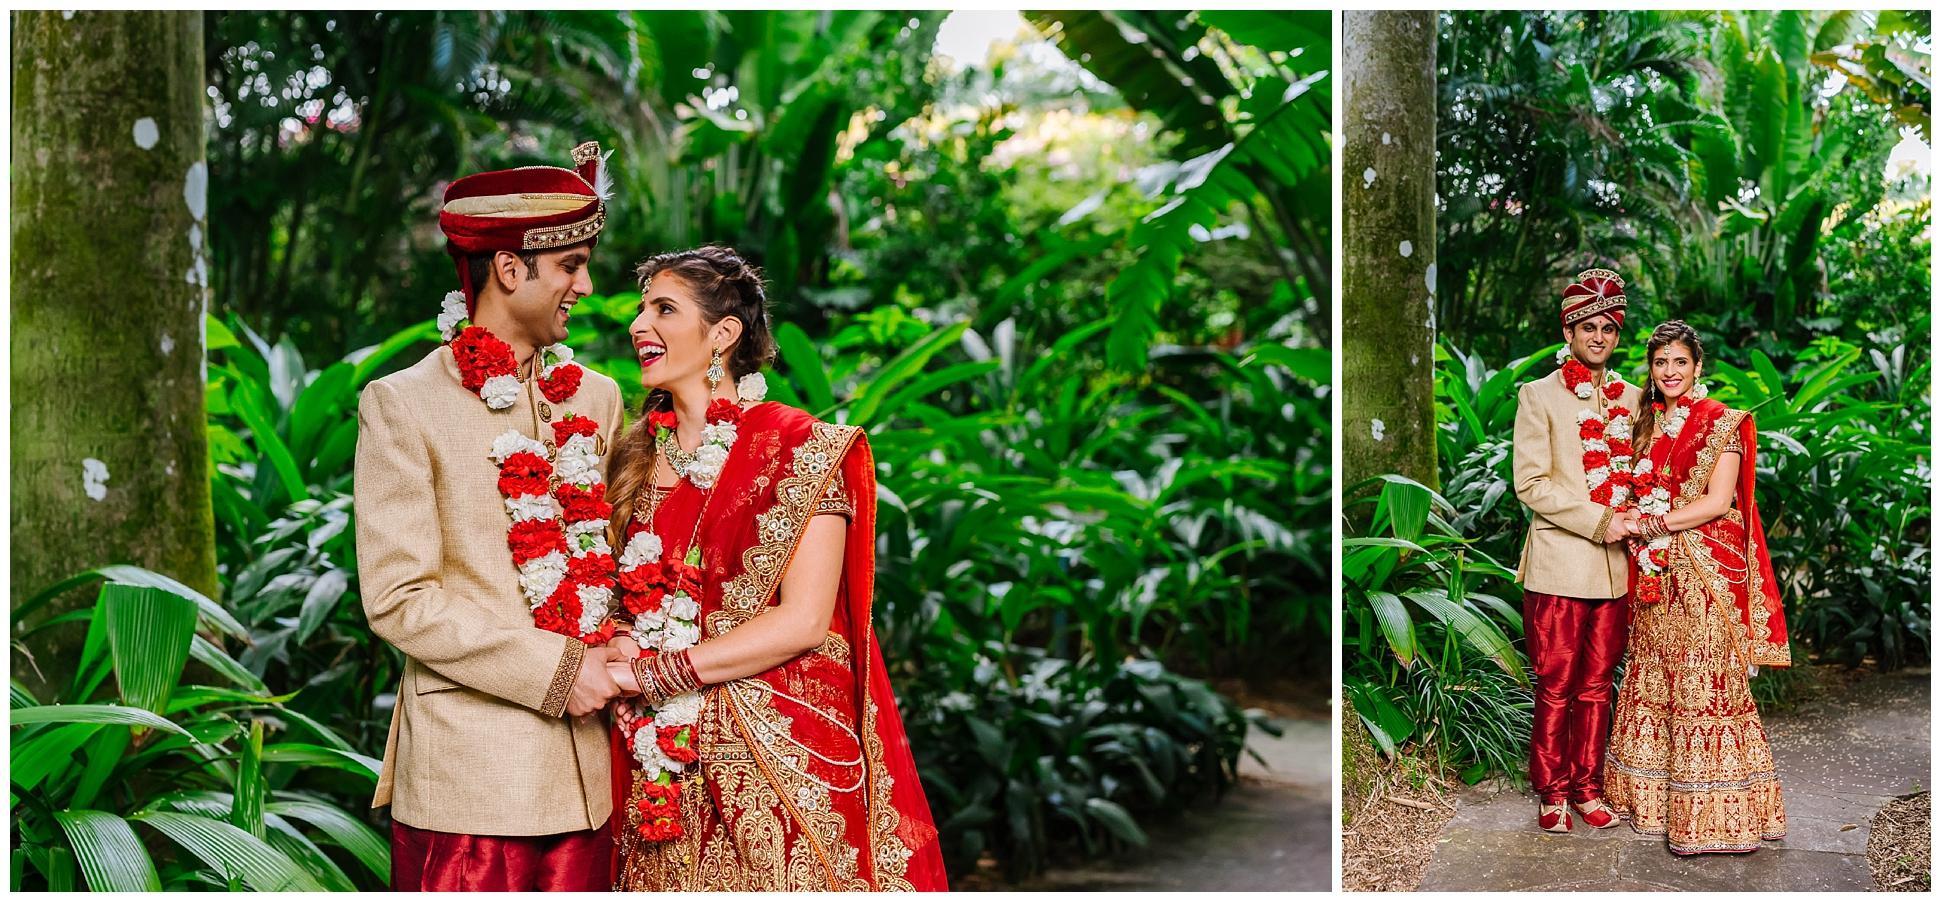 St-pete-indian-wedding-photographer-barat-sunken-gardens_0132.jpg